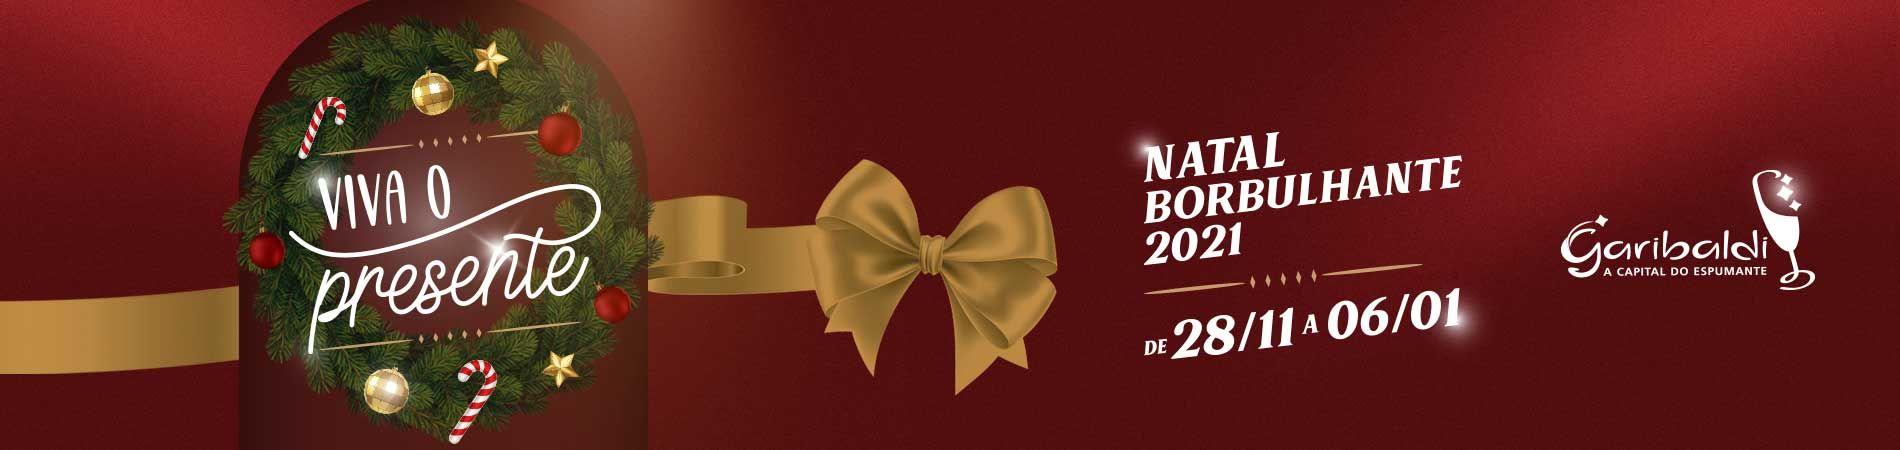 Banner 3 - Natal Bortulhante 2021